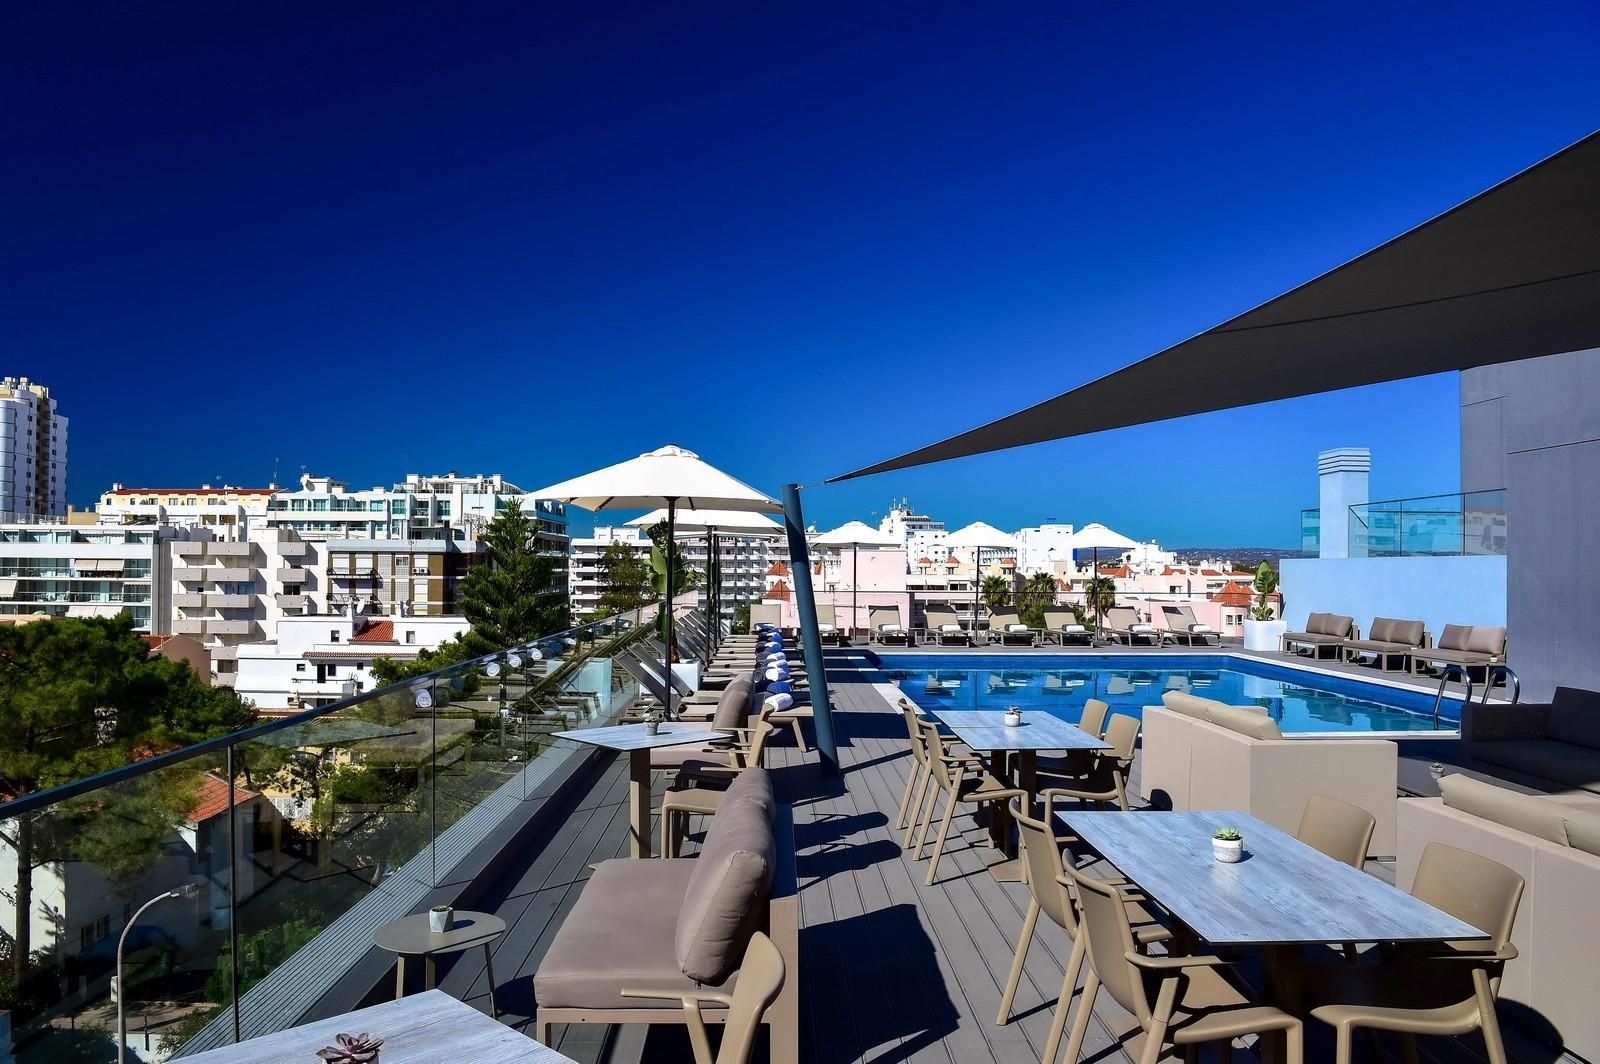 hotel Prime Energize Hotel: A Project by Nini Andrade Silva L08zbS8tME0zWnJTbS95UXN3TzdTbk1qbi9uampUN2prc2tqakZzN1JTc2tuTTNTc1NKU25yTUVTczR0enRka3I